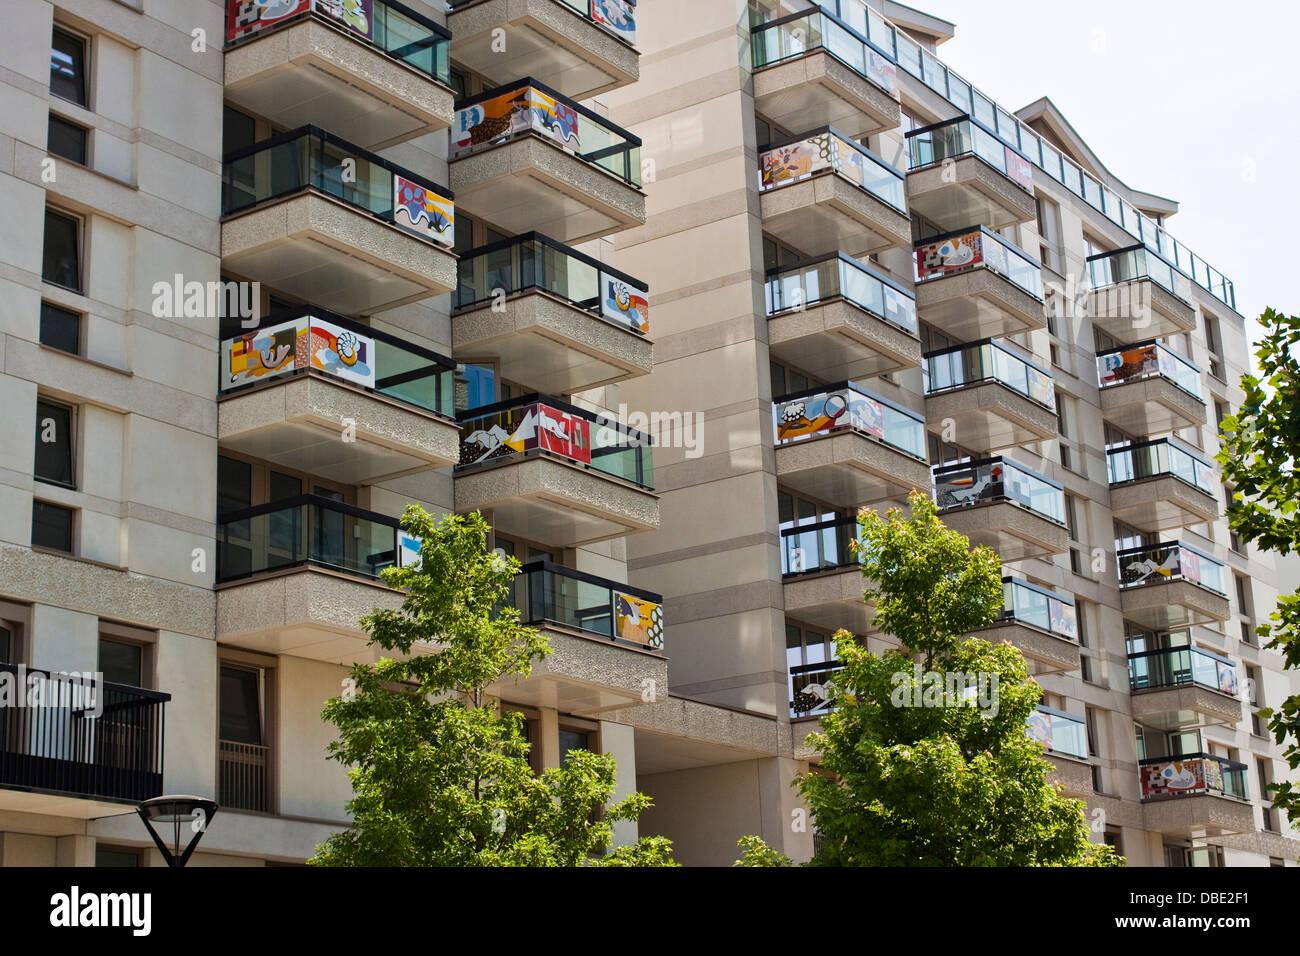 Village Stratford Apartments